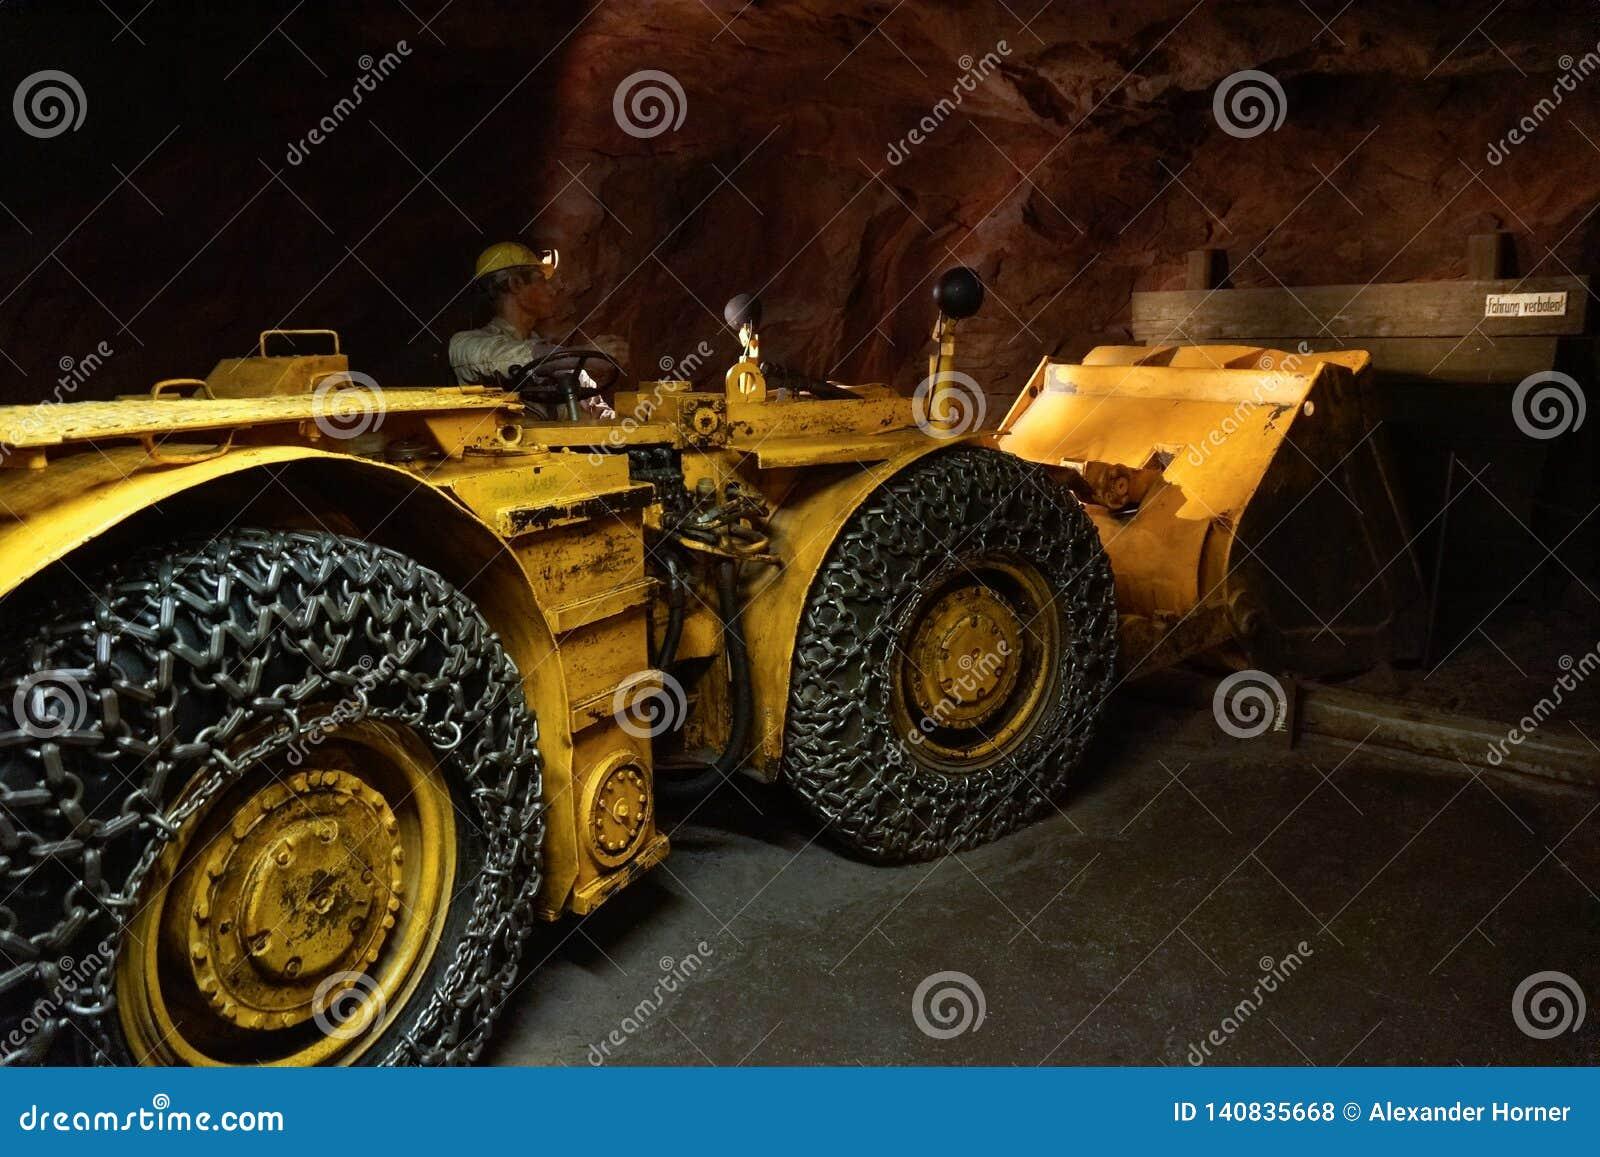 Bulldozer working in tunnel pushing gravel outside